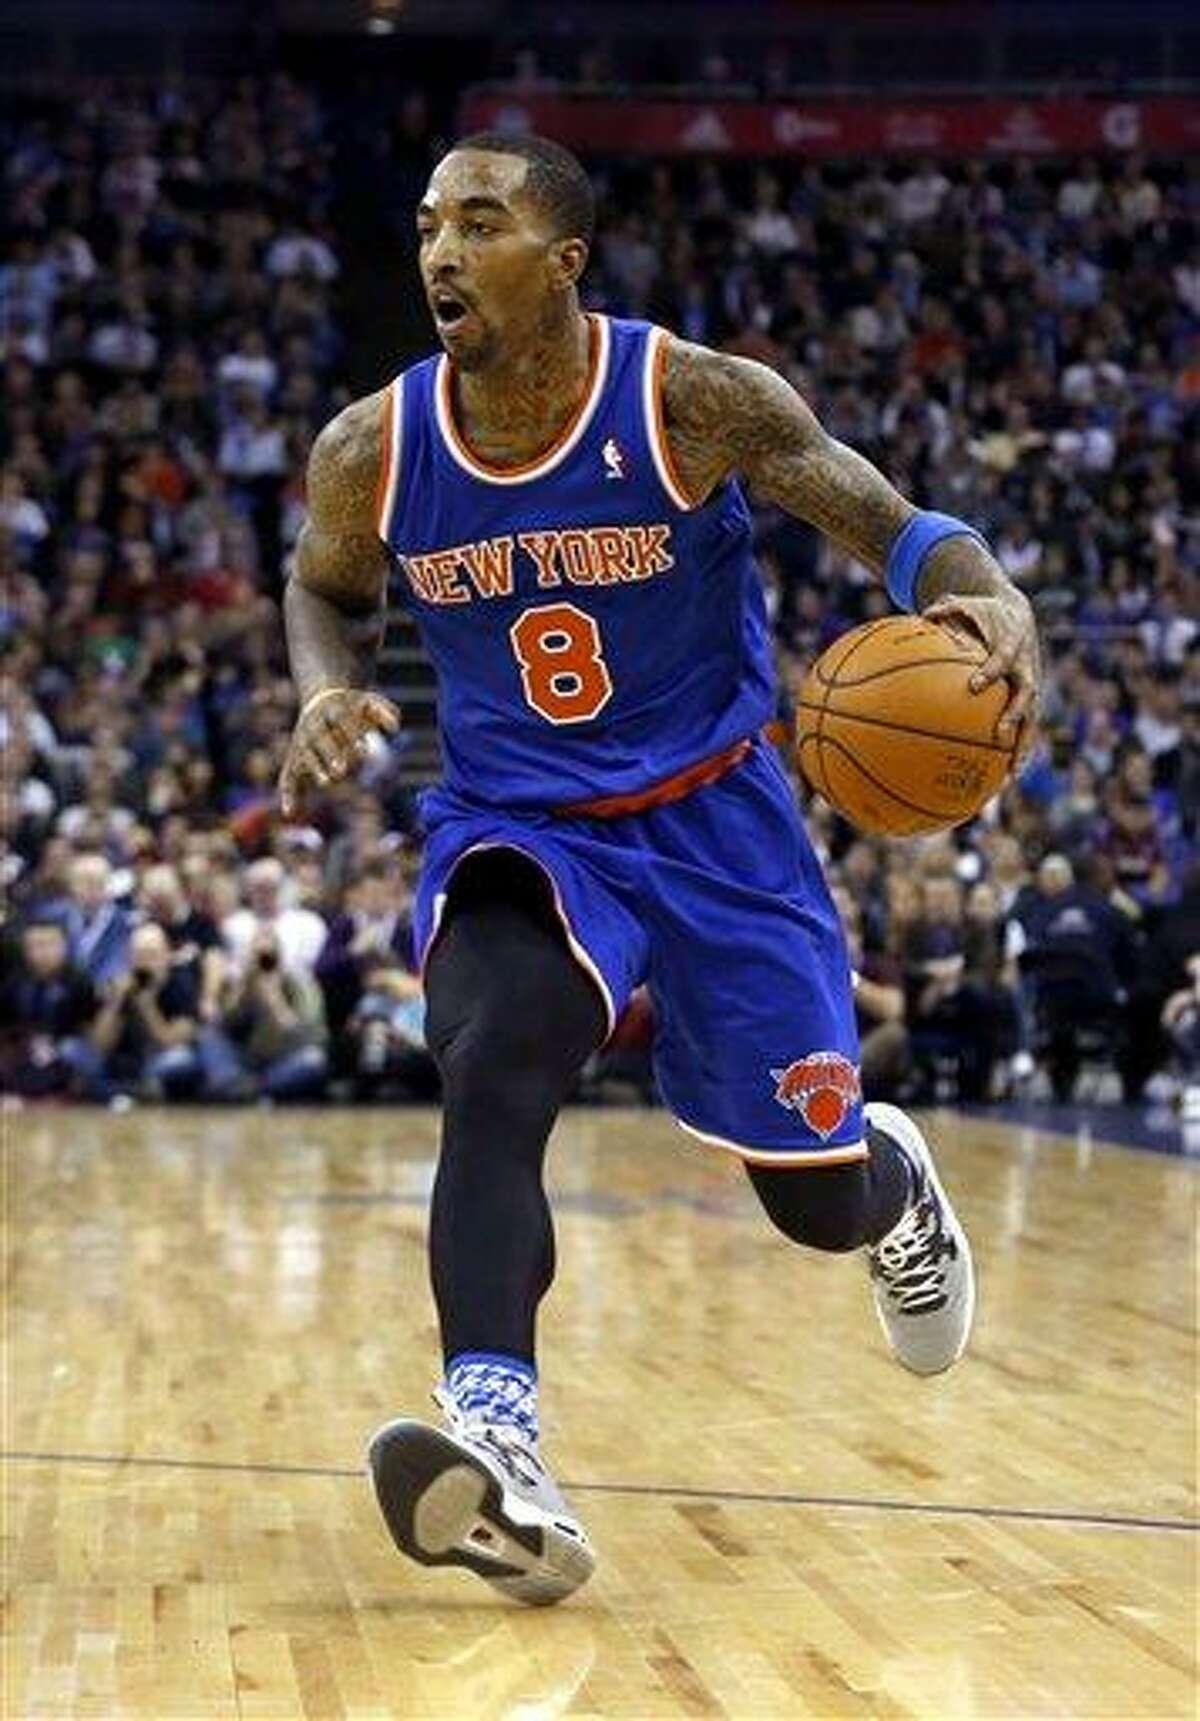 New York Knicks guard J.R. Smith dribbles the ball during their NBA basketball game against Detroit Pistons at the 02 arena in London, Thursday, Jan. 17, 2013. (AP Photo/Matt Dunham)